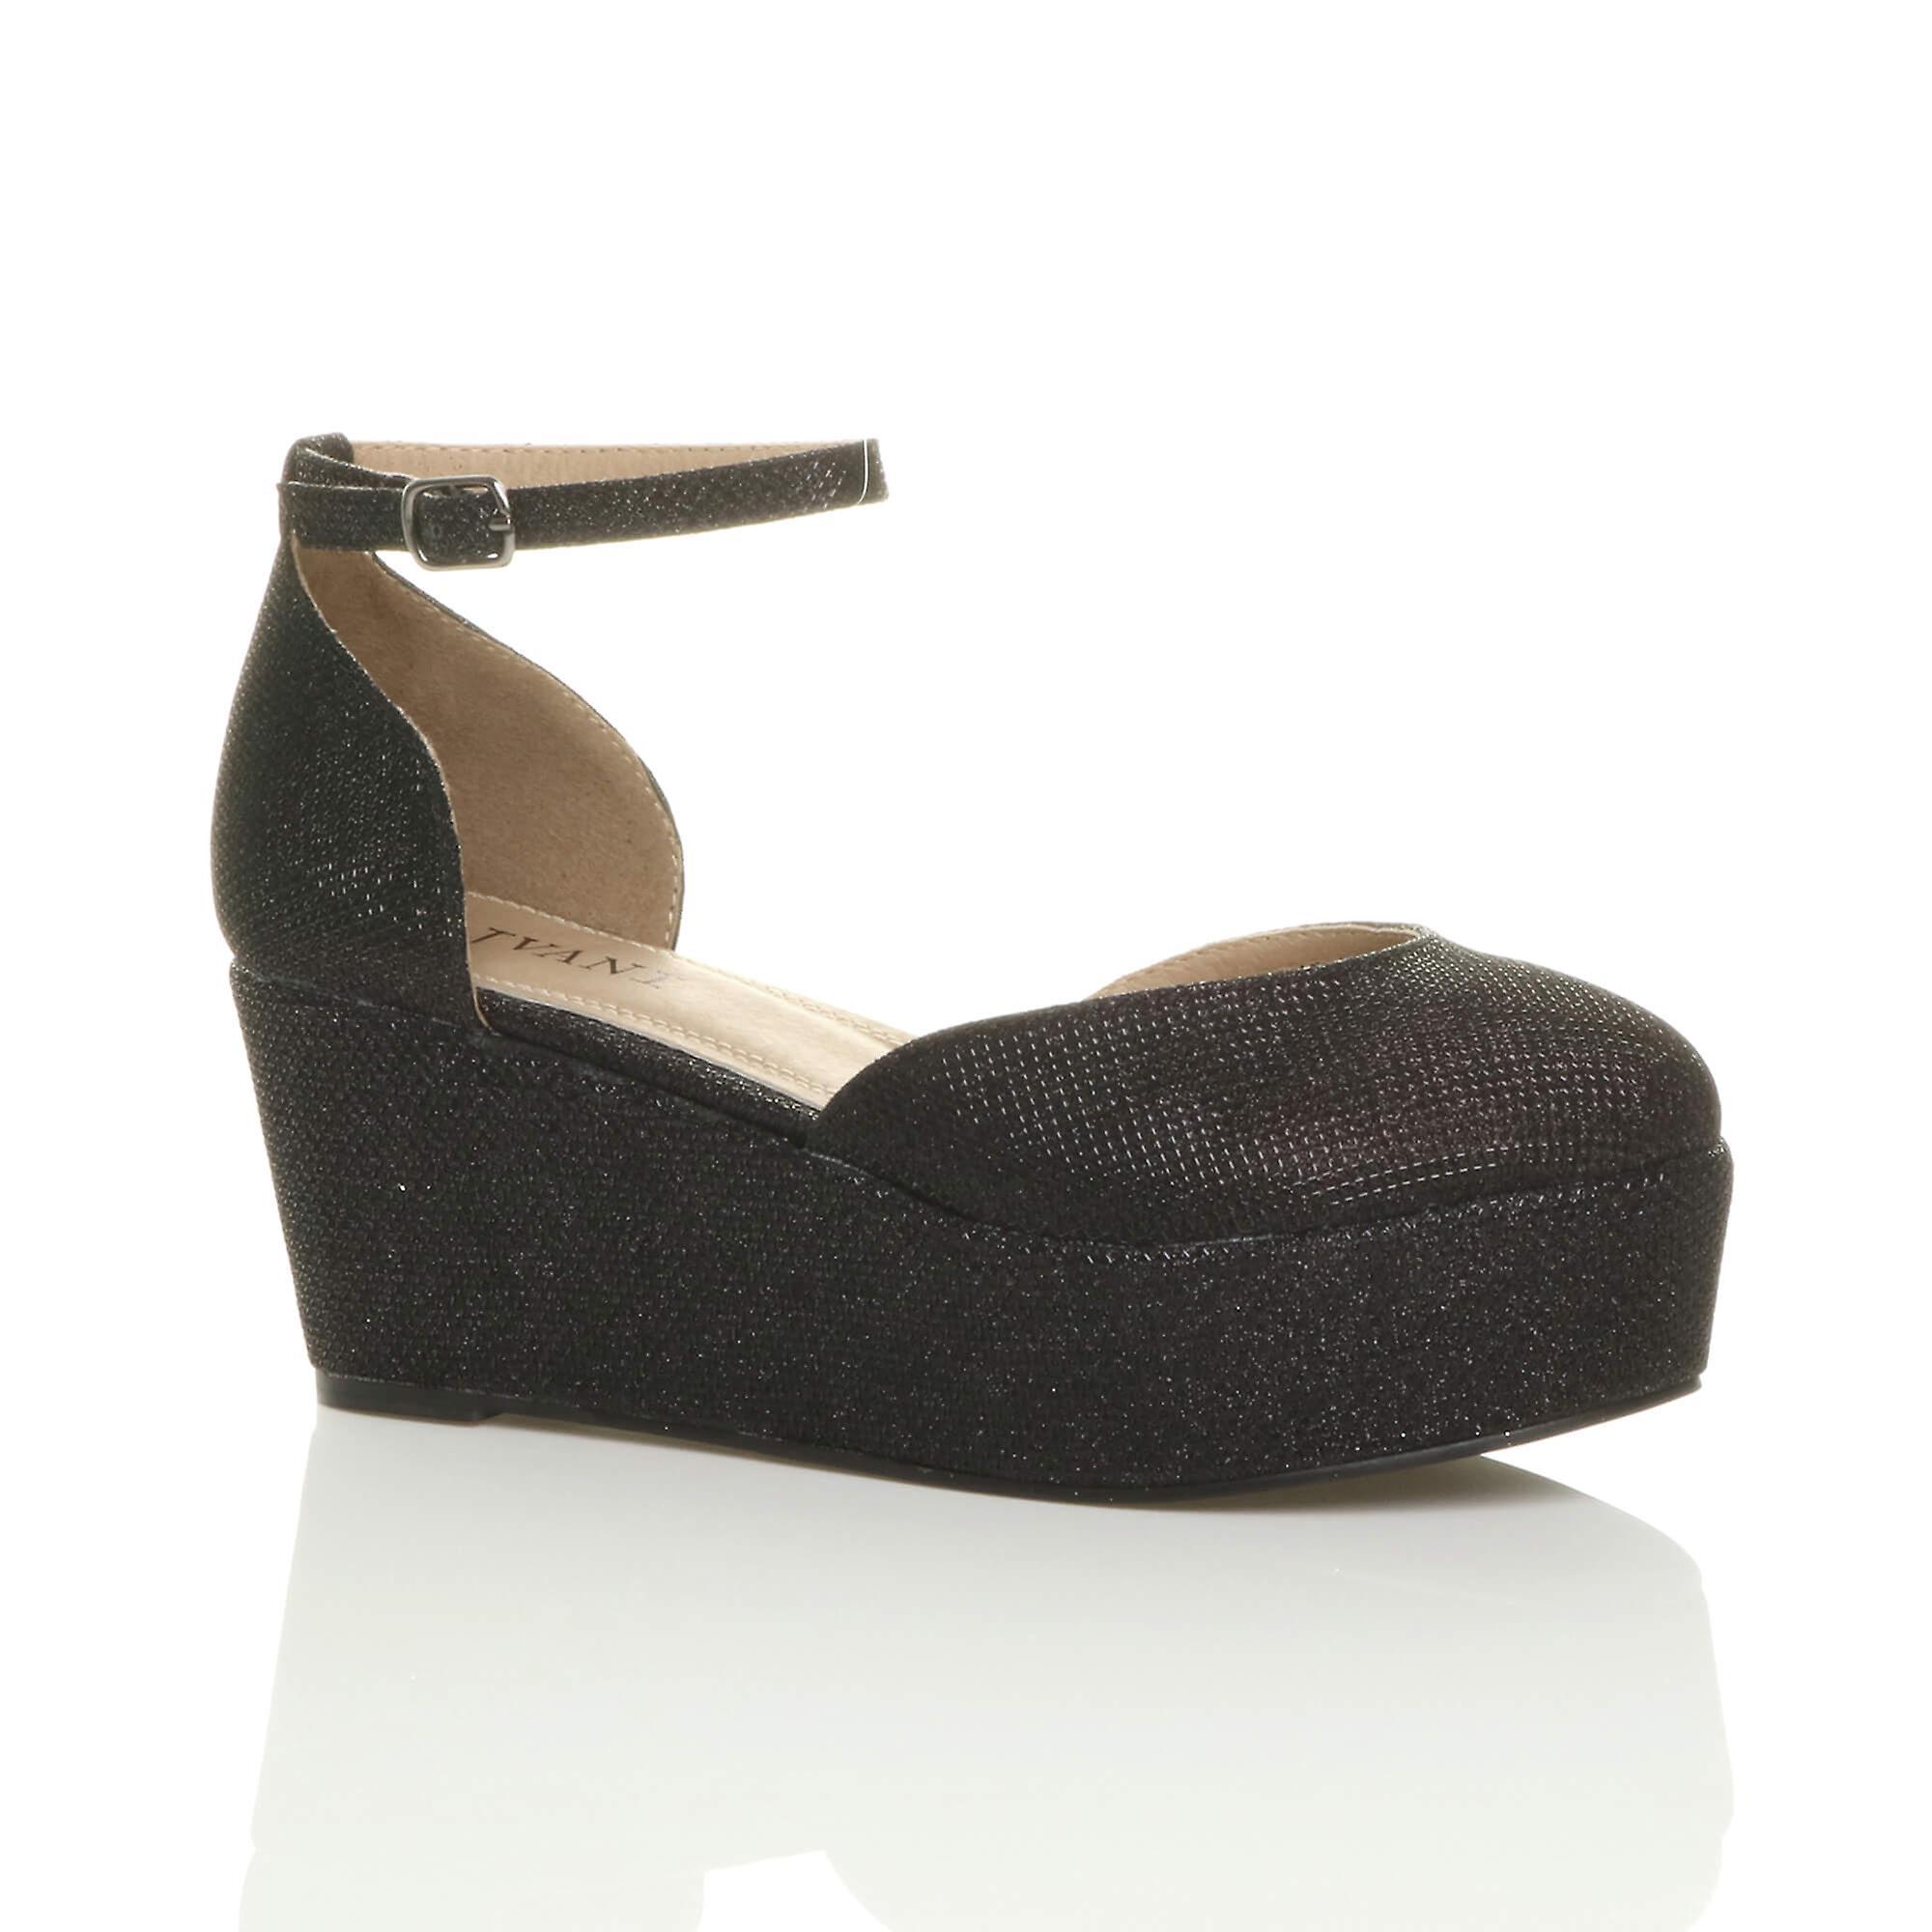 Ajvani womens mid low wedge flatform platform ankle strap court shoes sandals